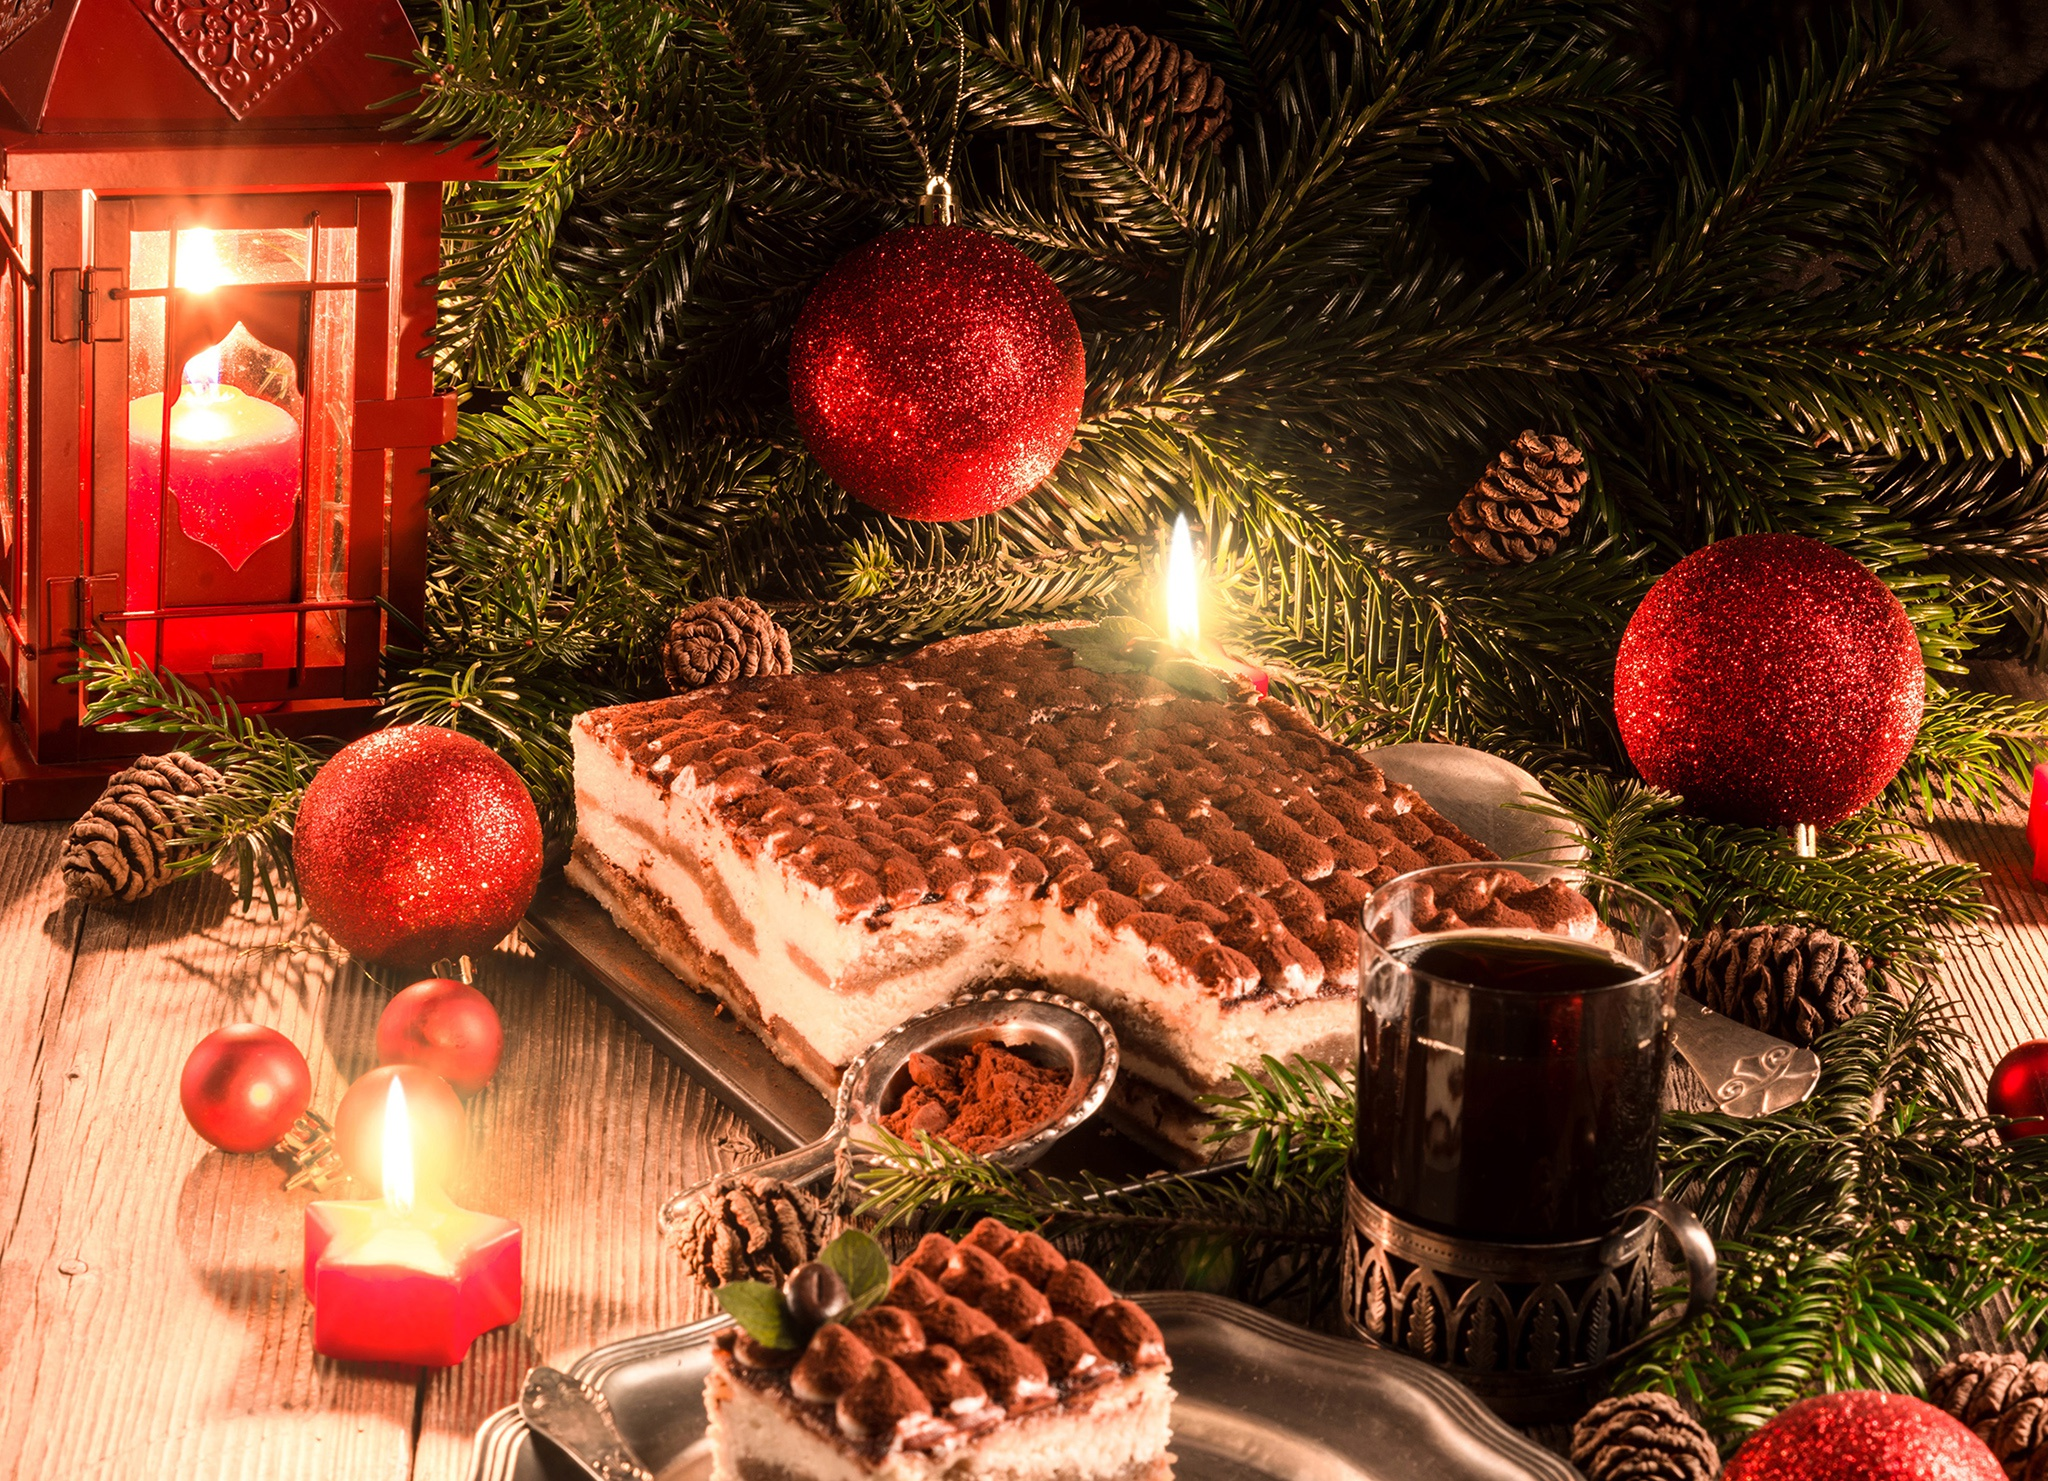 Картинки новогодний стол и елка